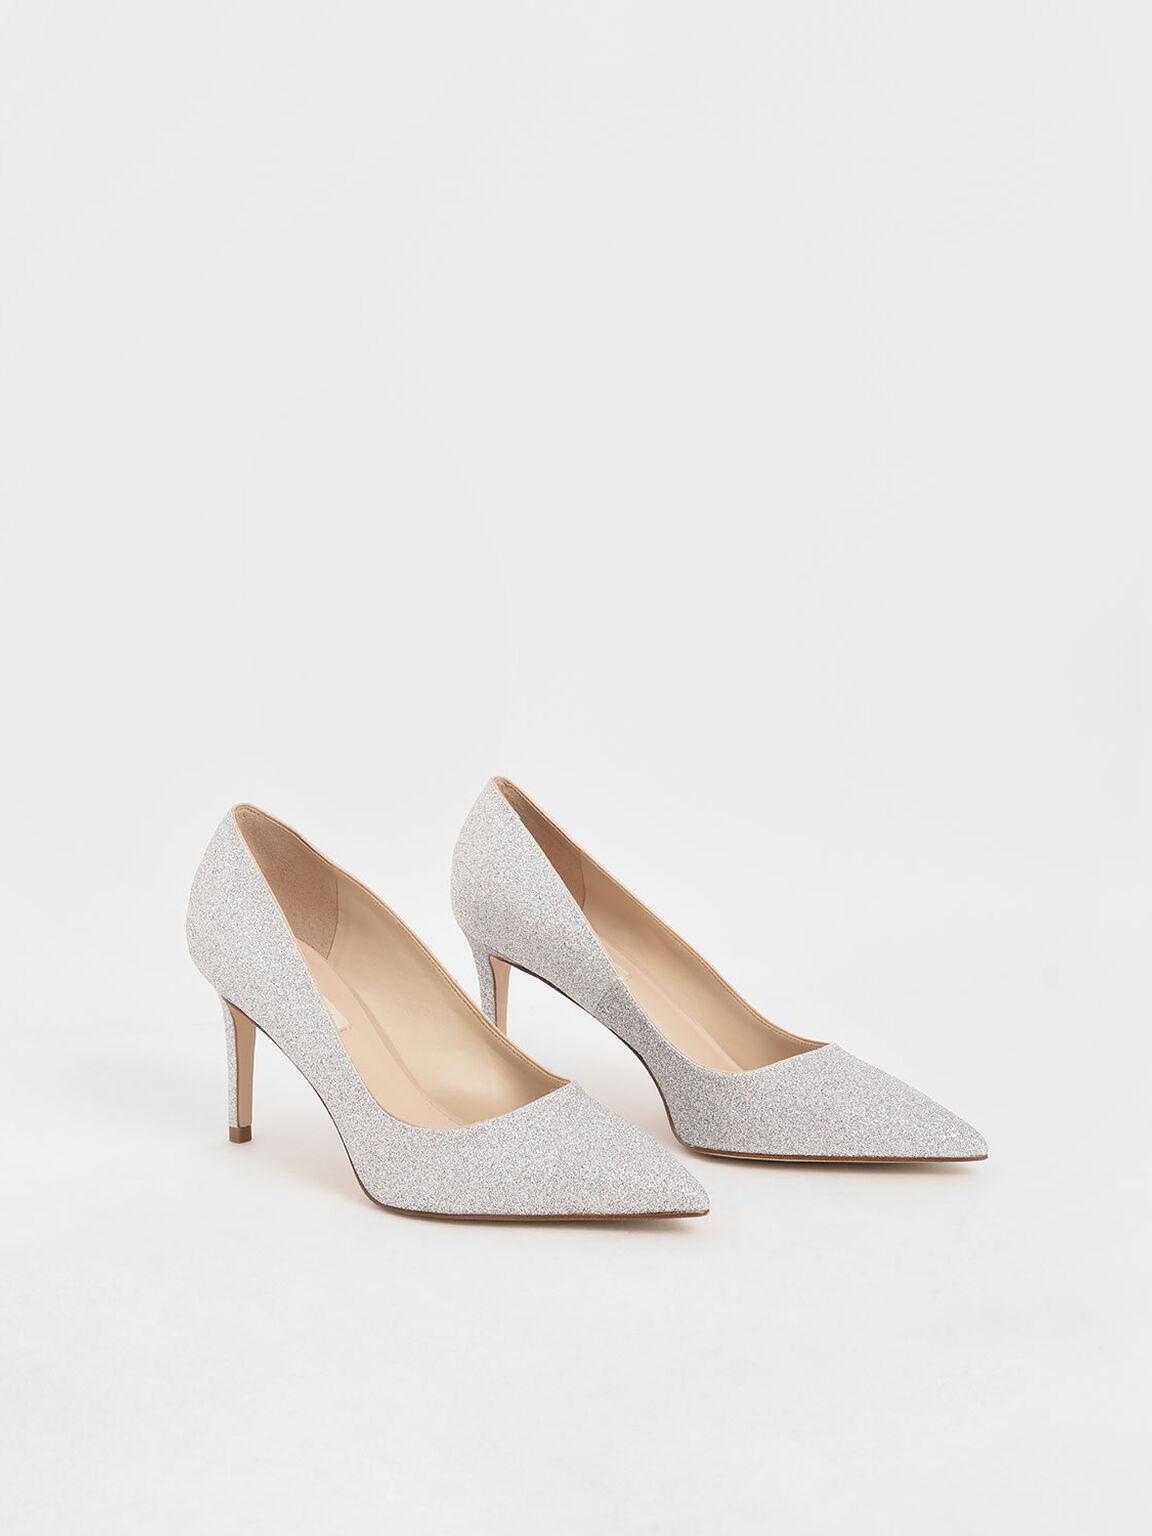 Glitter Stiletto Heel Pumps, Silver, hi-res